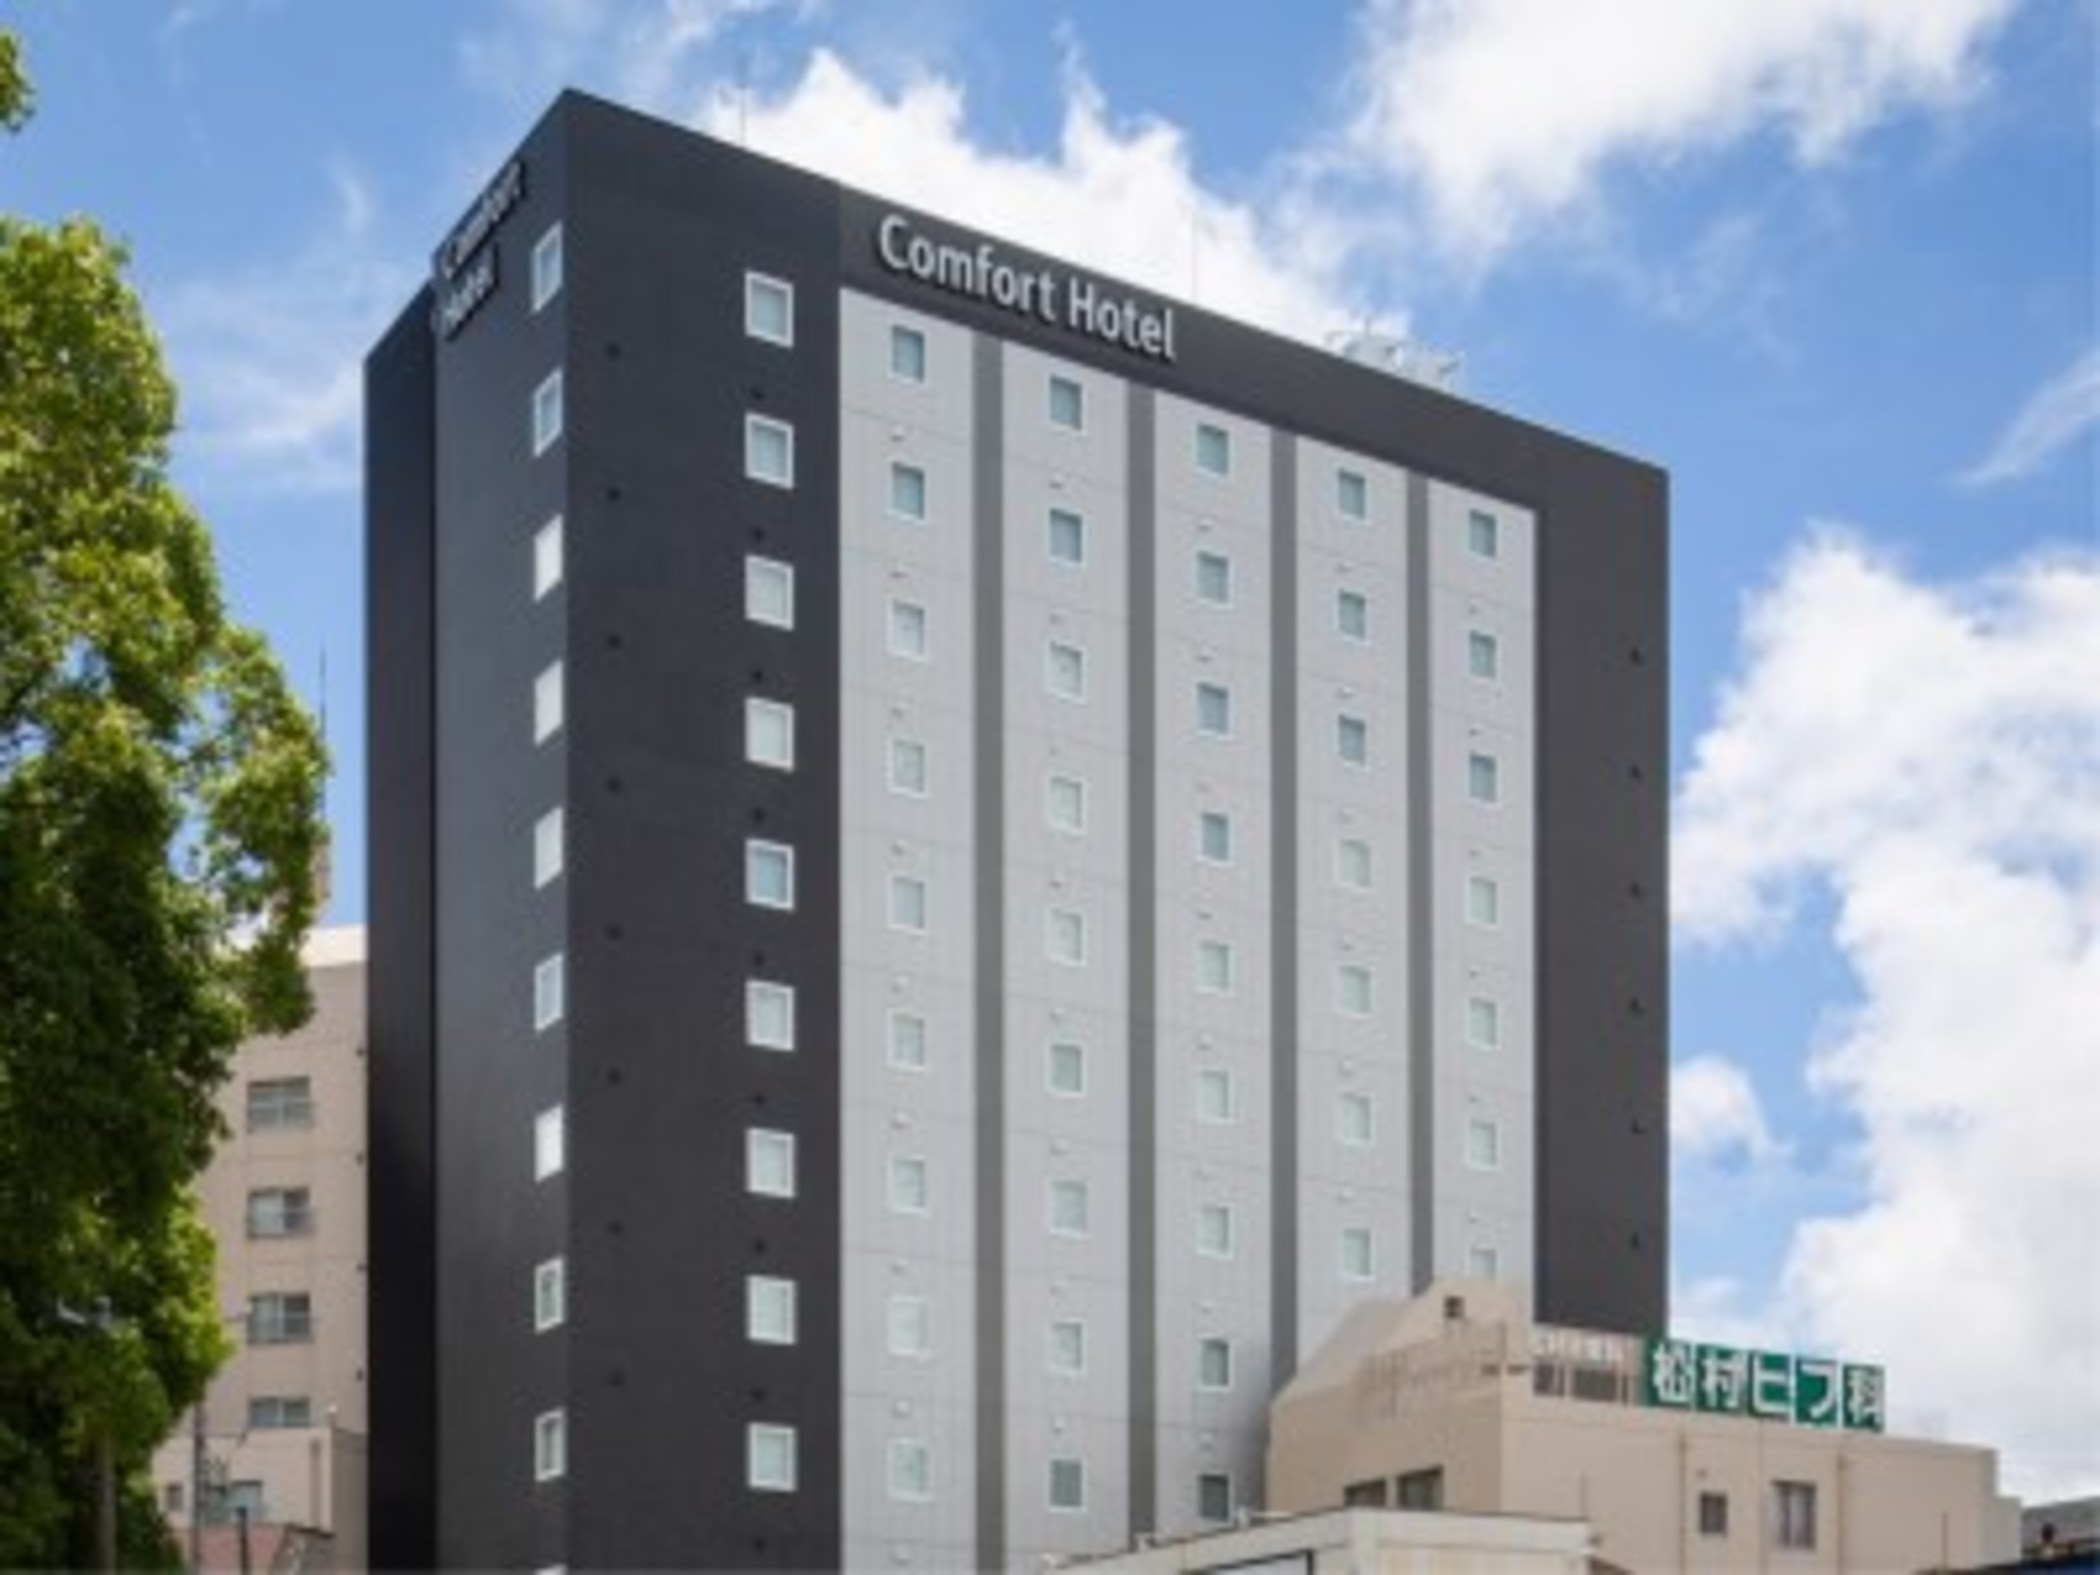 Comfort Hotel Ise, Ise